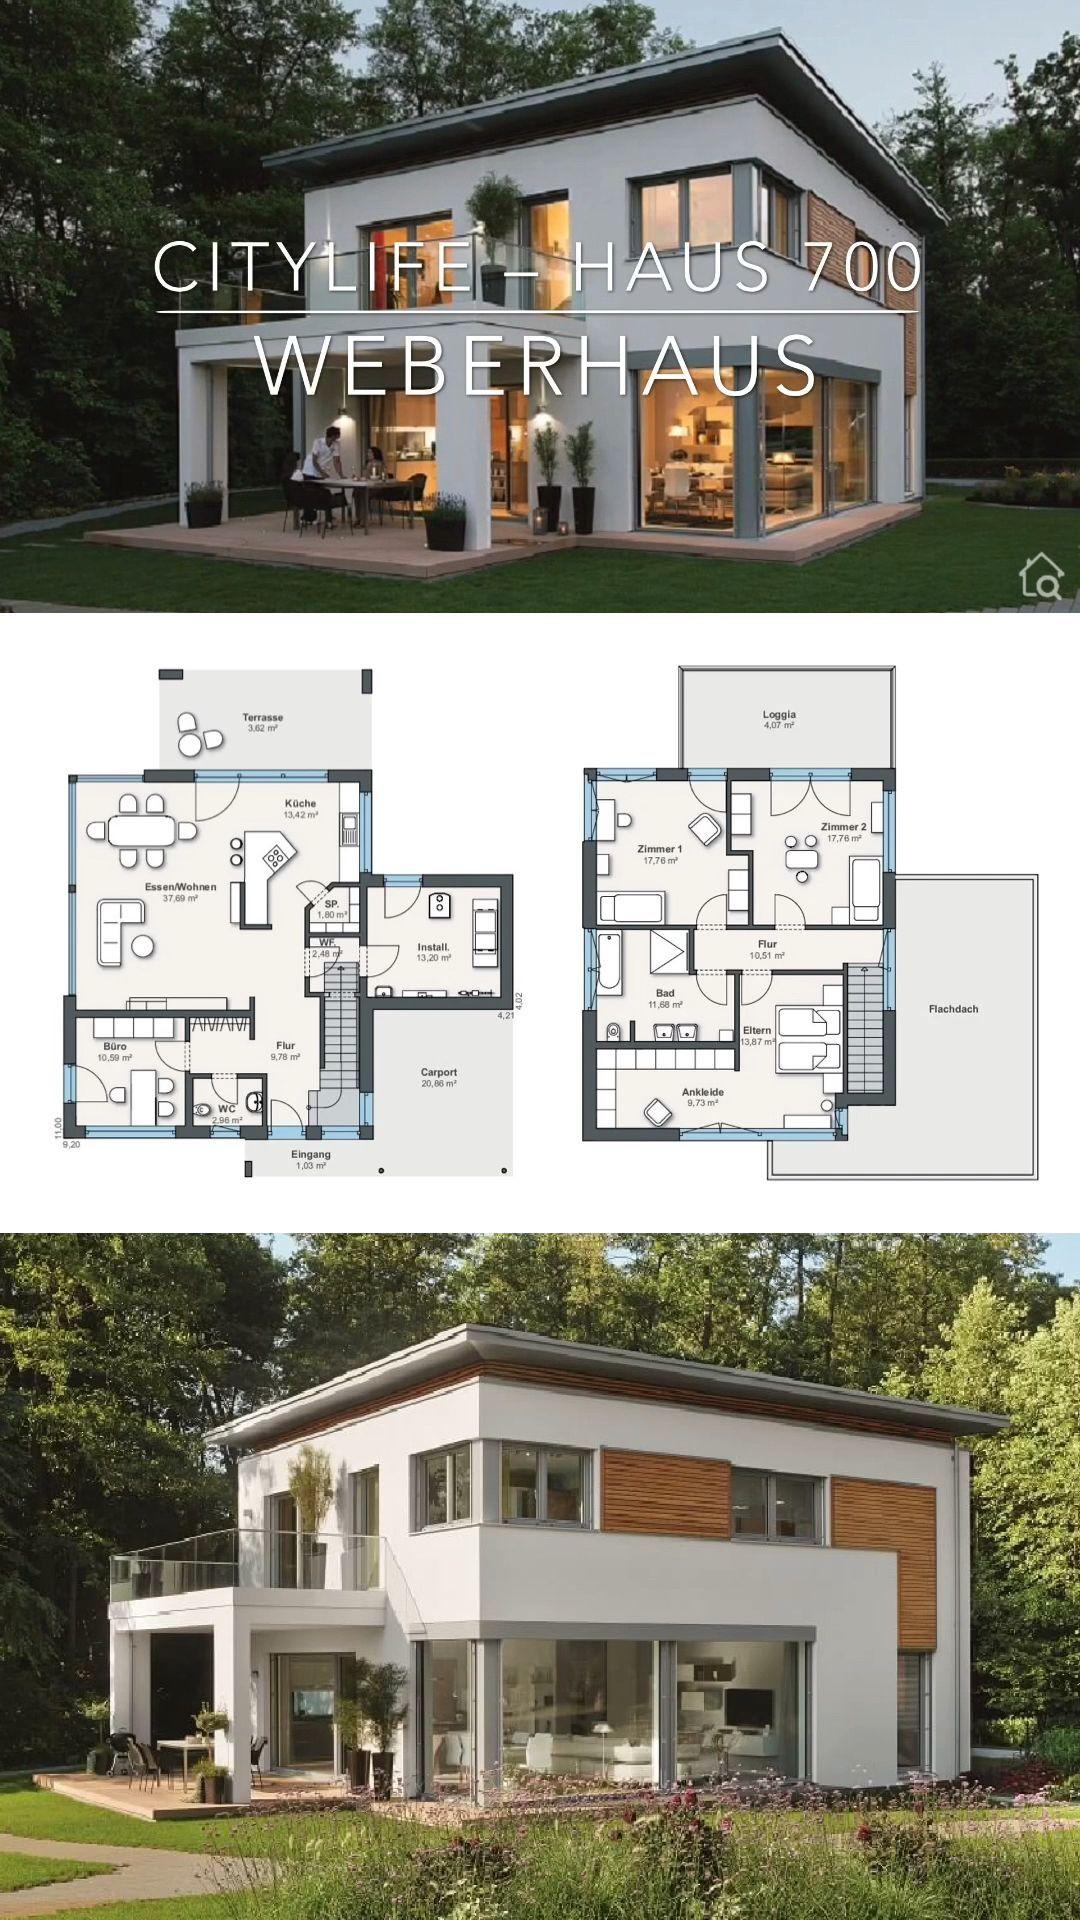 Modern European House Plan With Bauhaus Architecture City Life 700 Dream Villa Plan Bauhaus Architecture House Architecture Design Modern Architecture Design